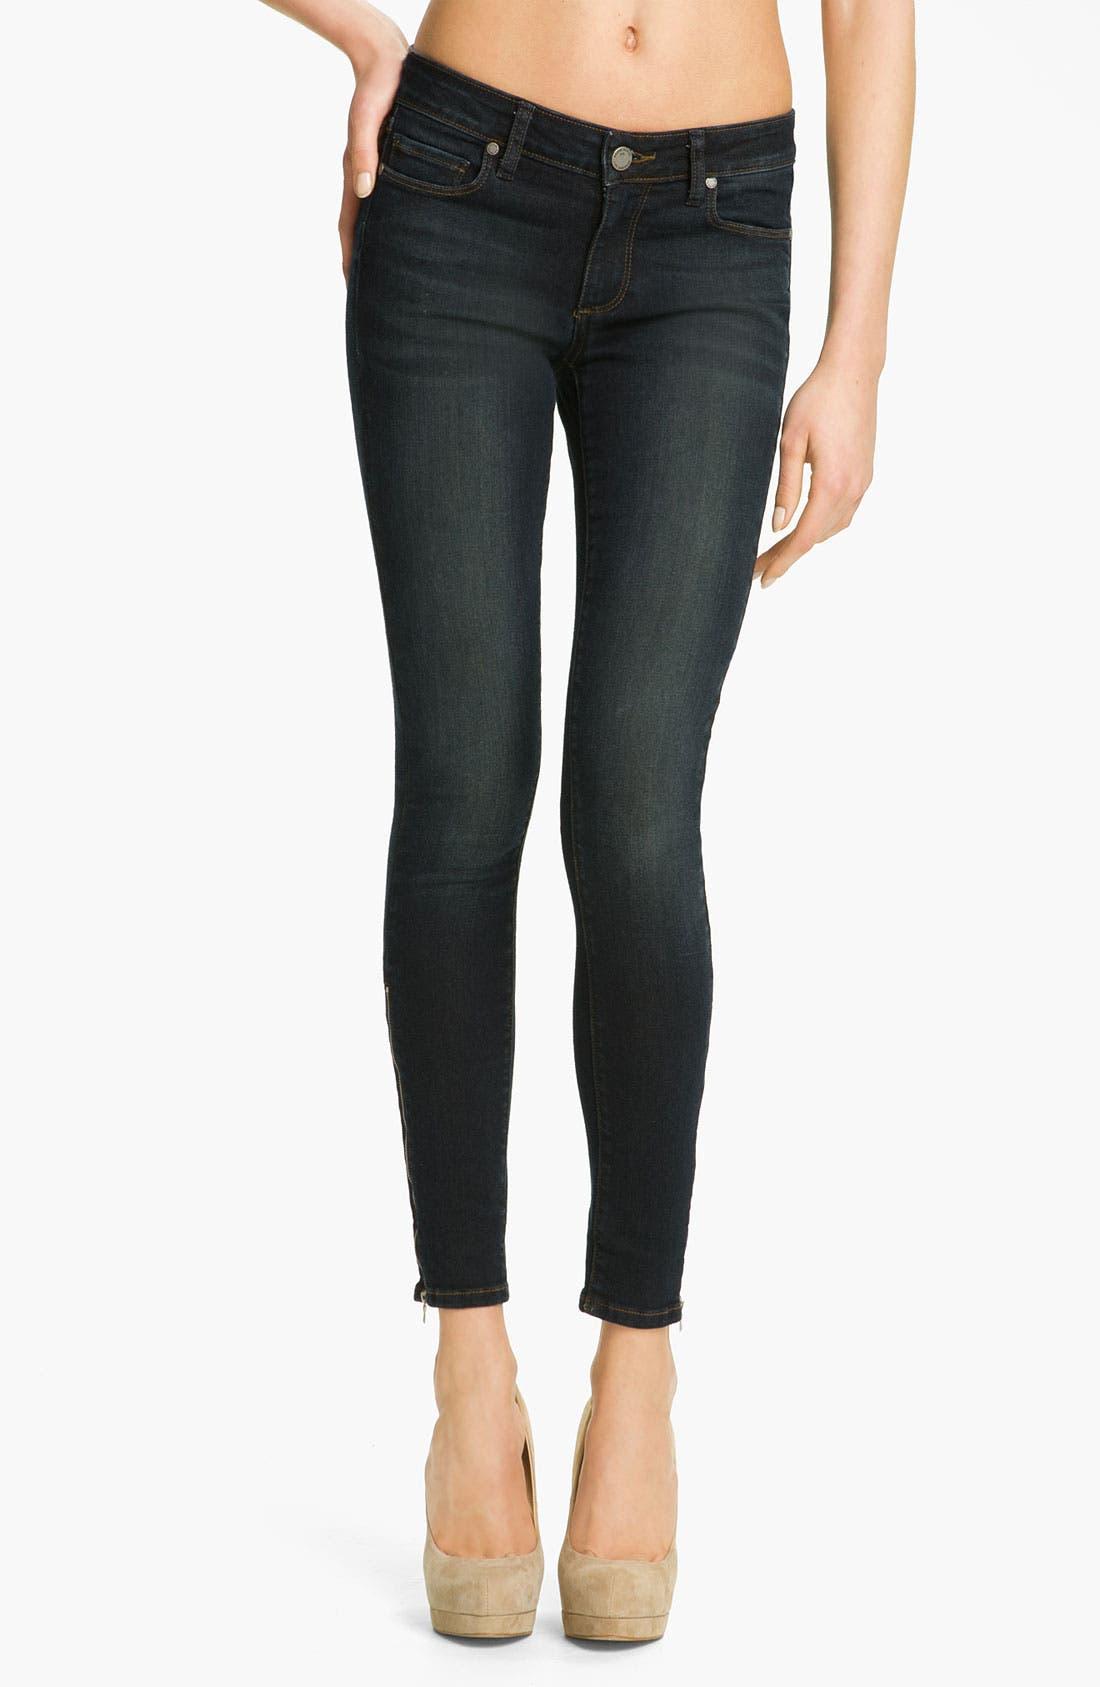 Alternate Image 1 Selected - Paige Denim 'Eve' Skinny Ankle Zip Skinny Jeans (Fairbanks)